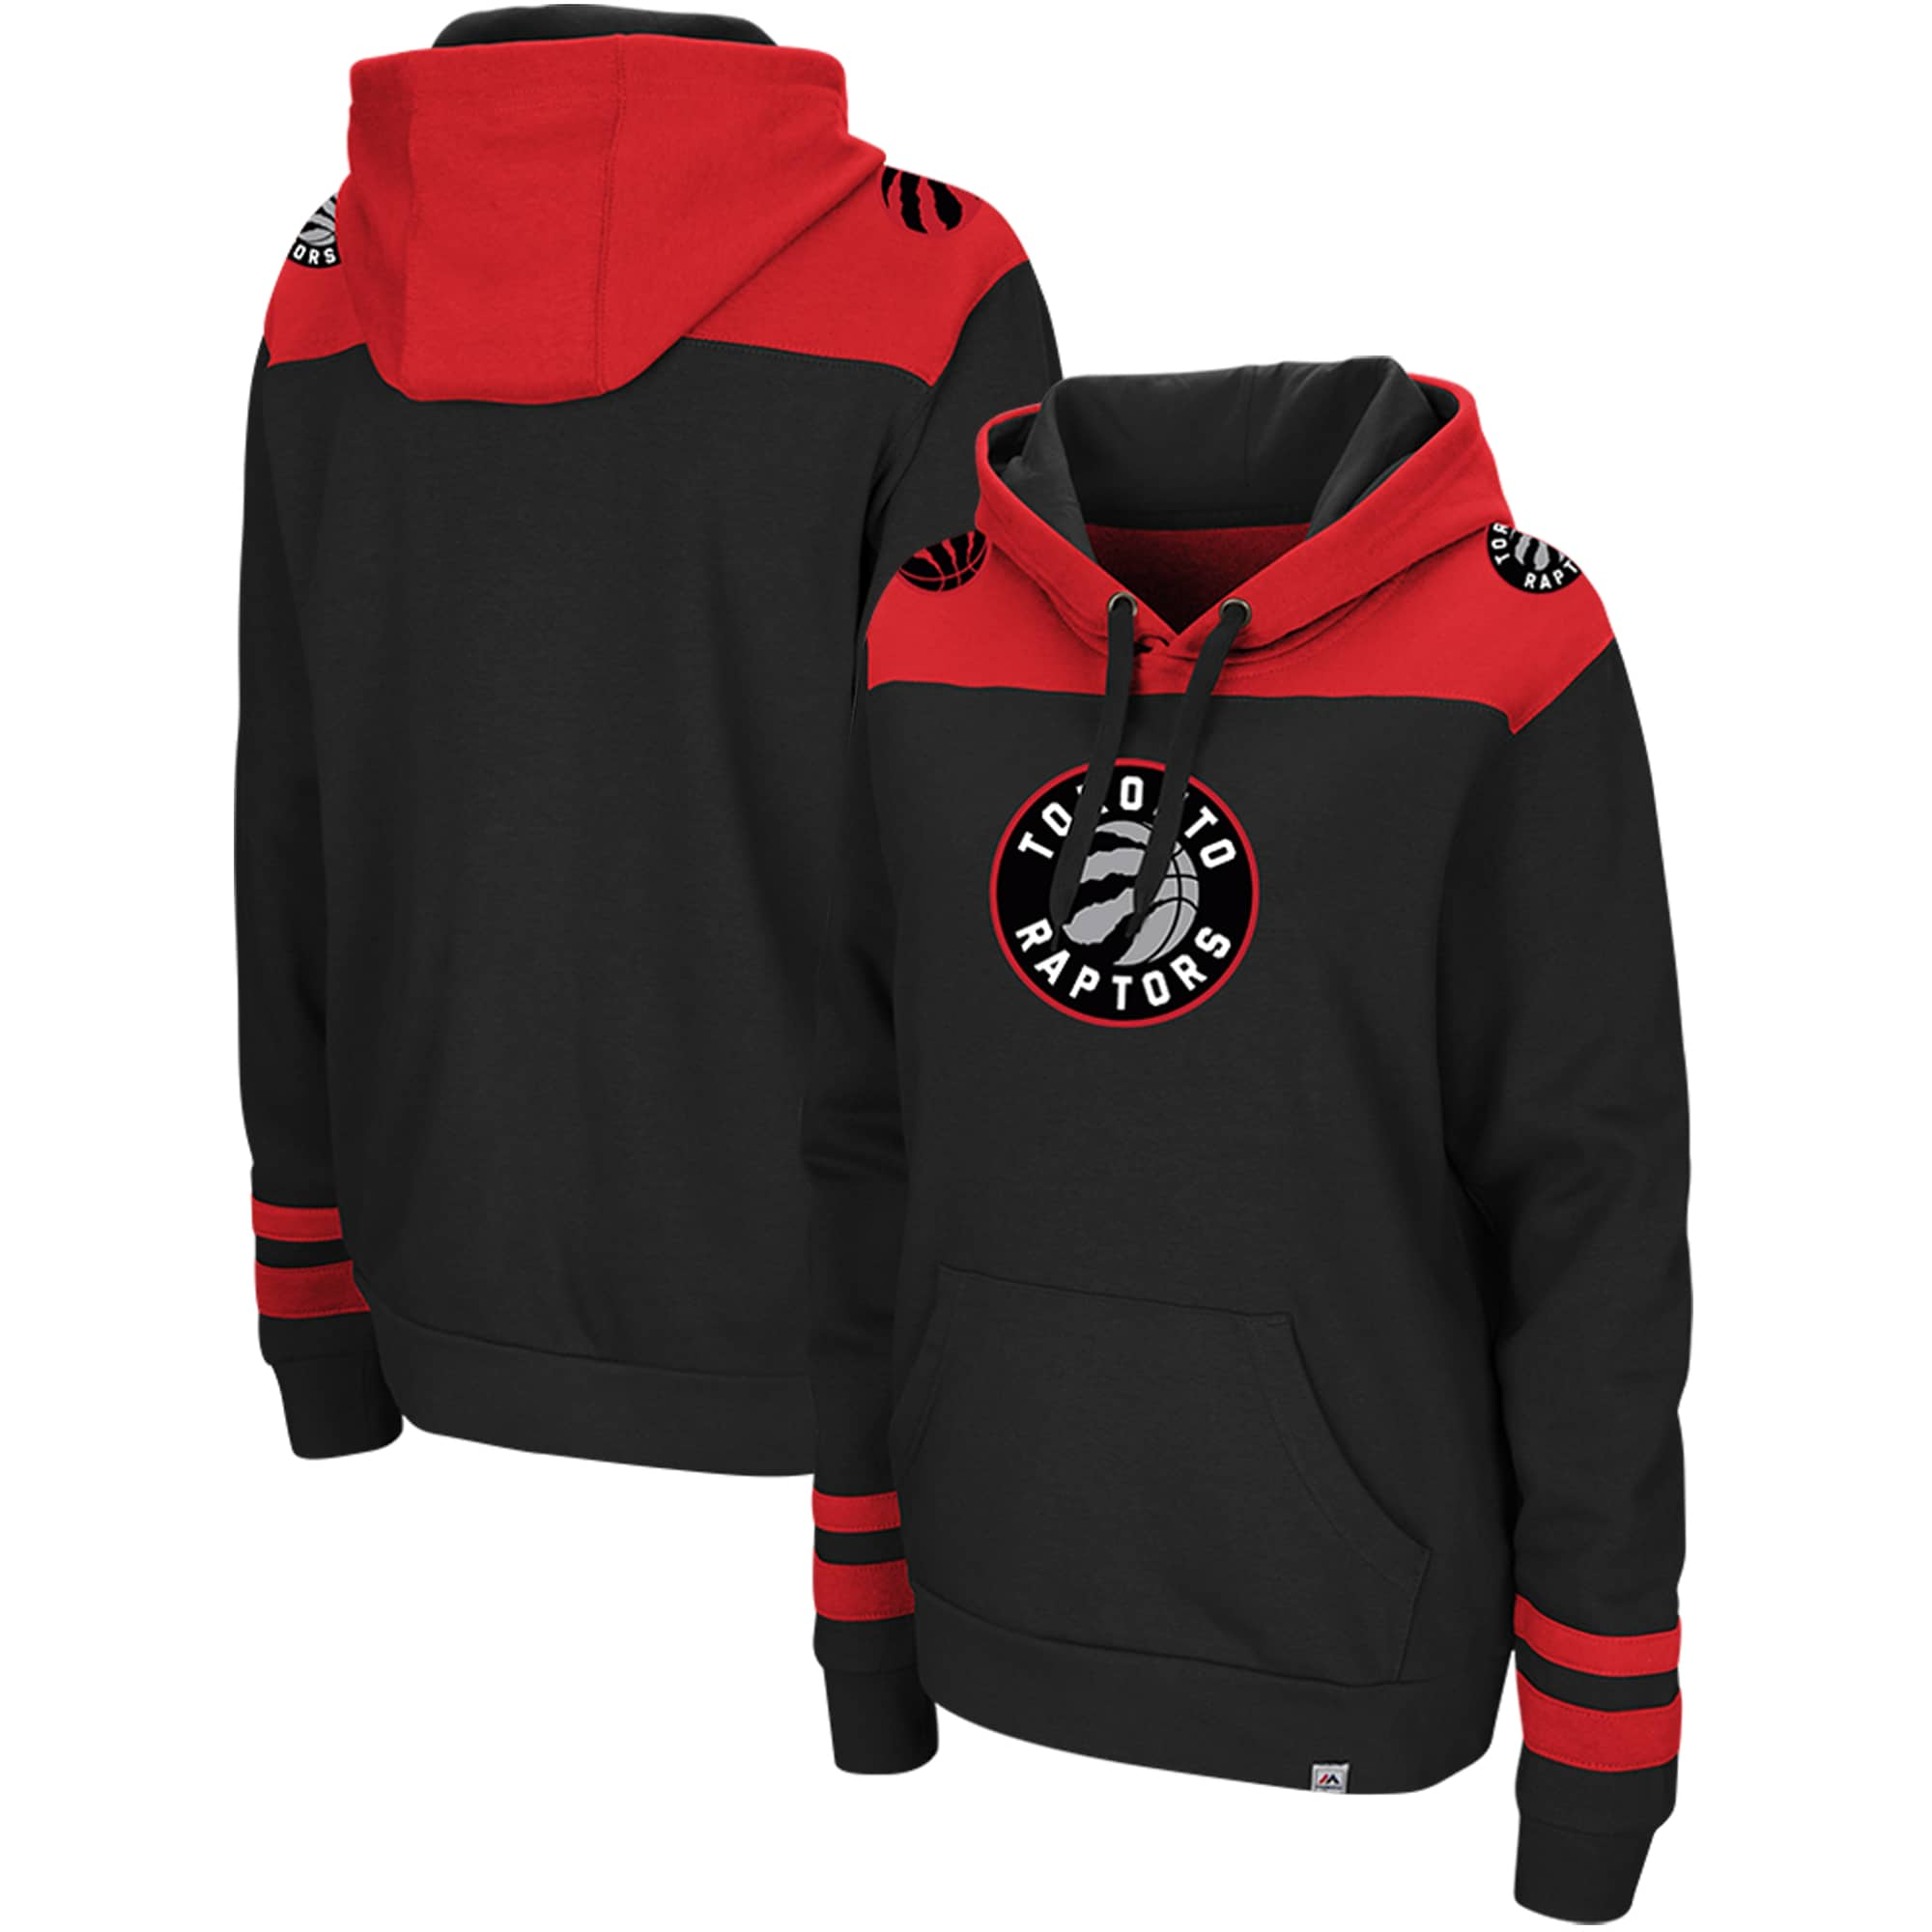 Toronto Raptors Majestic Triple Double Pullover Hoodie - Black/Red